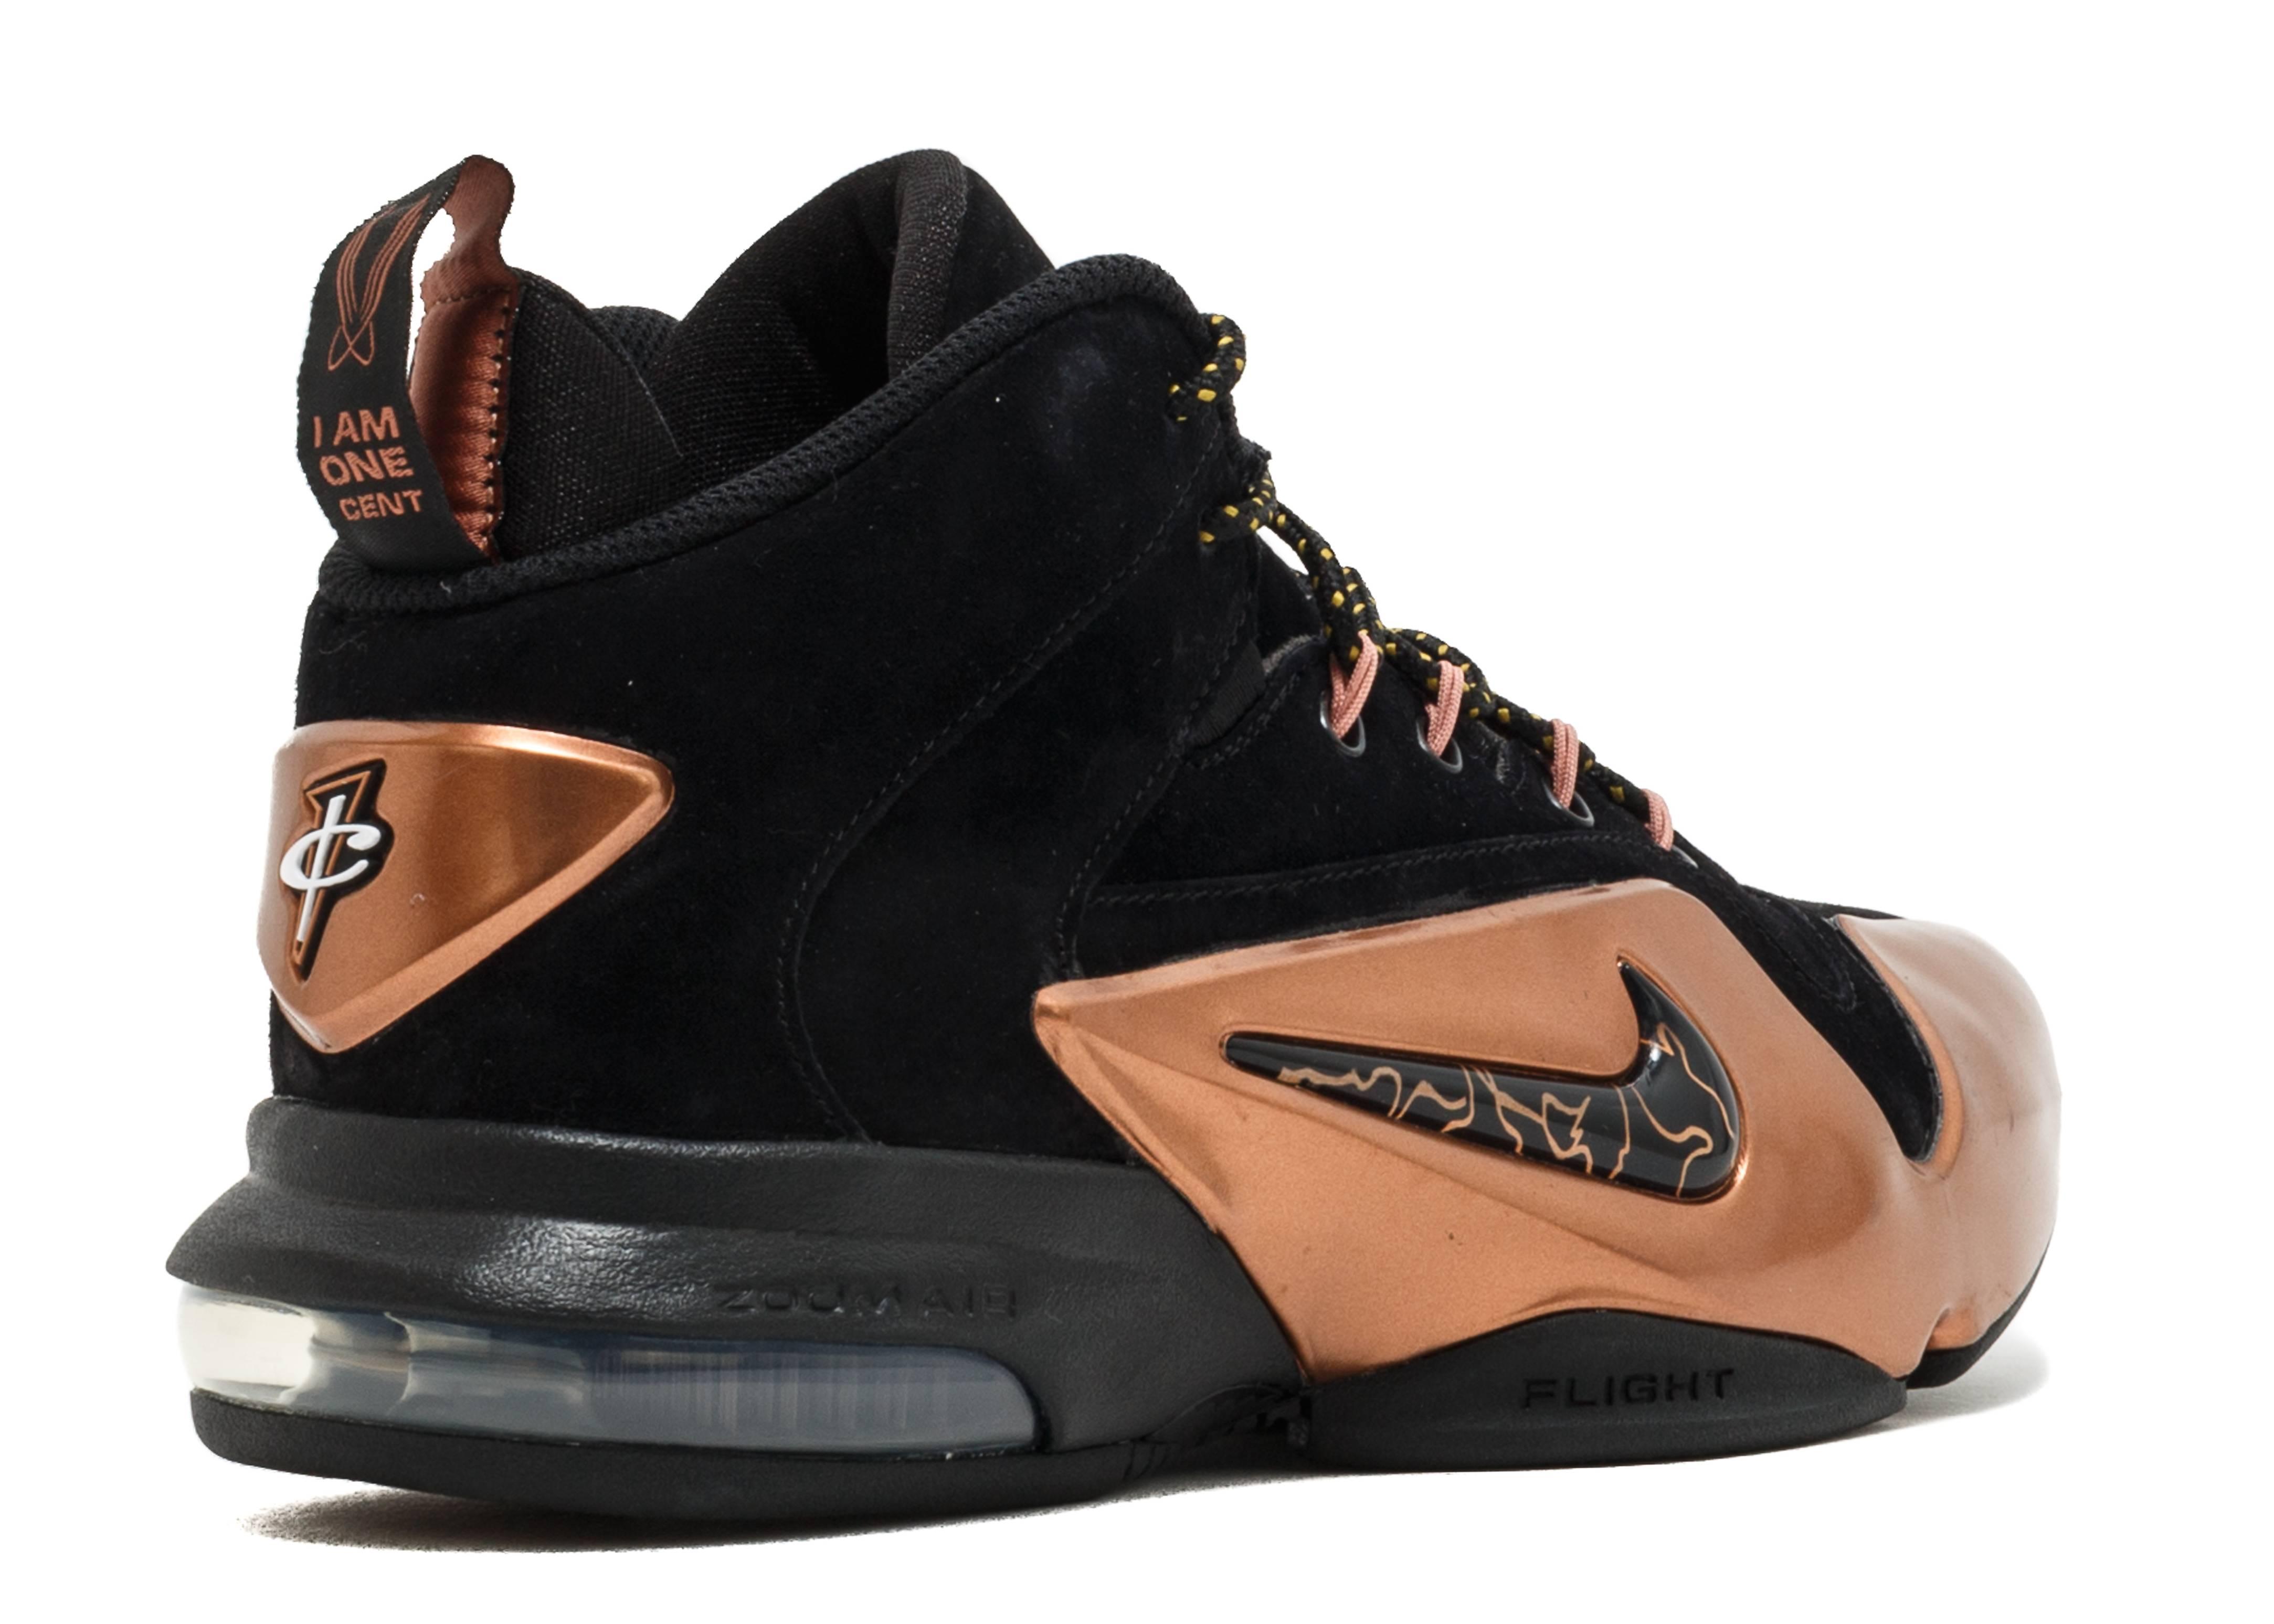 reputable site 43eb8 ca93e Zoom Penny VI - Nike - 749629 001 - black black metallic copper   Flight  Club